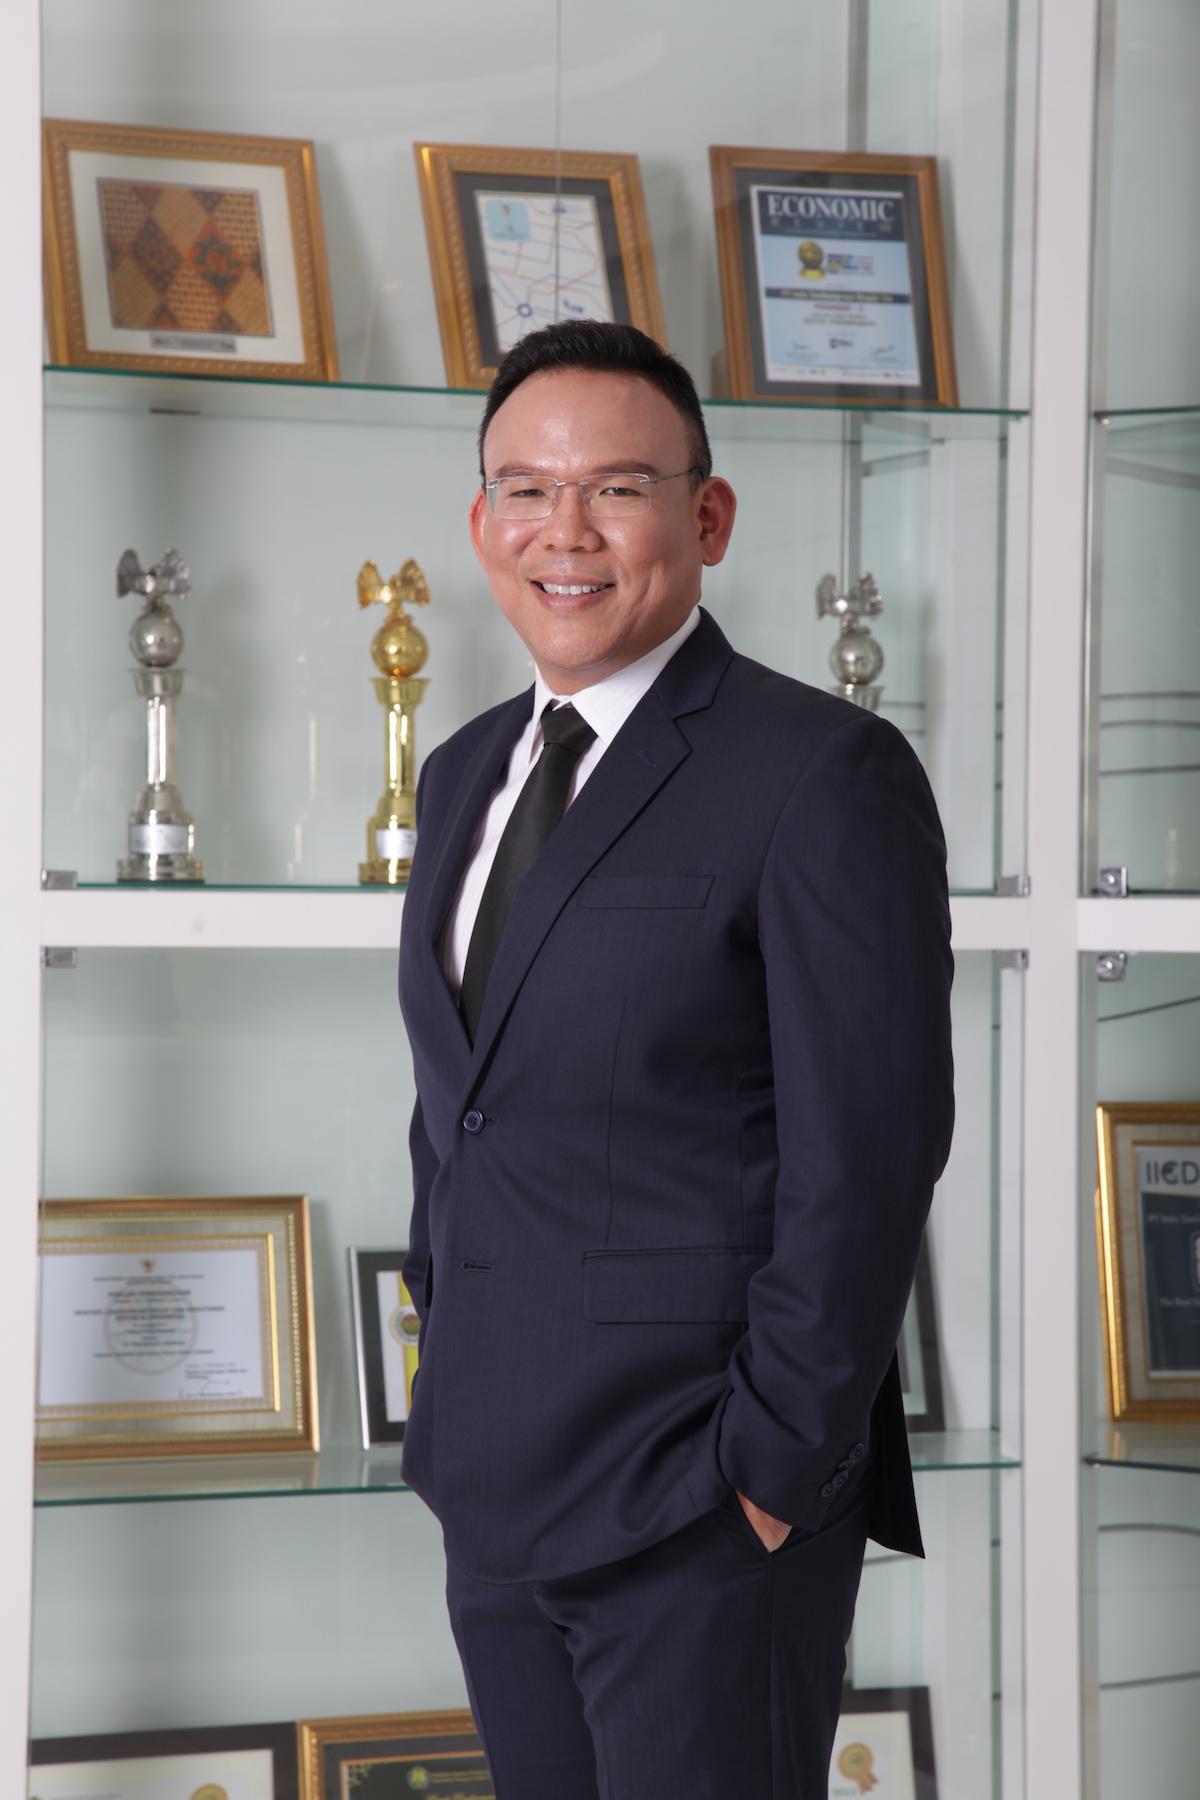 Kirana Limpaphayom President Director of Indo Tambangraya Megah